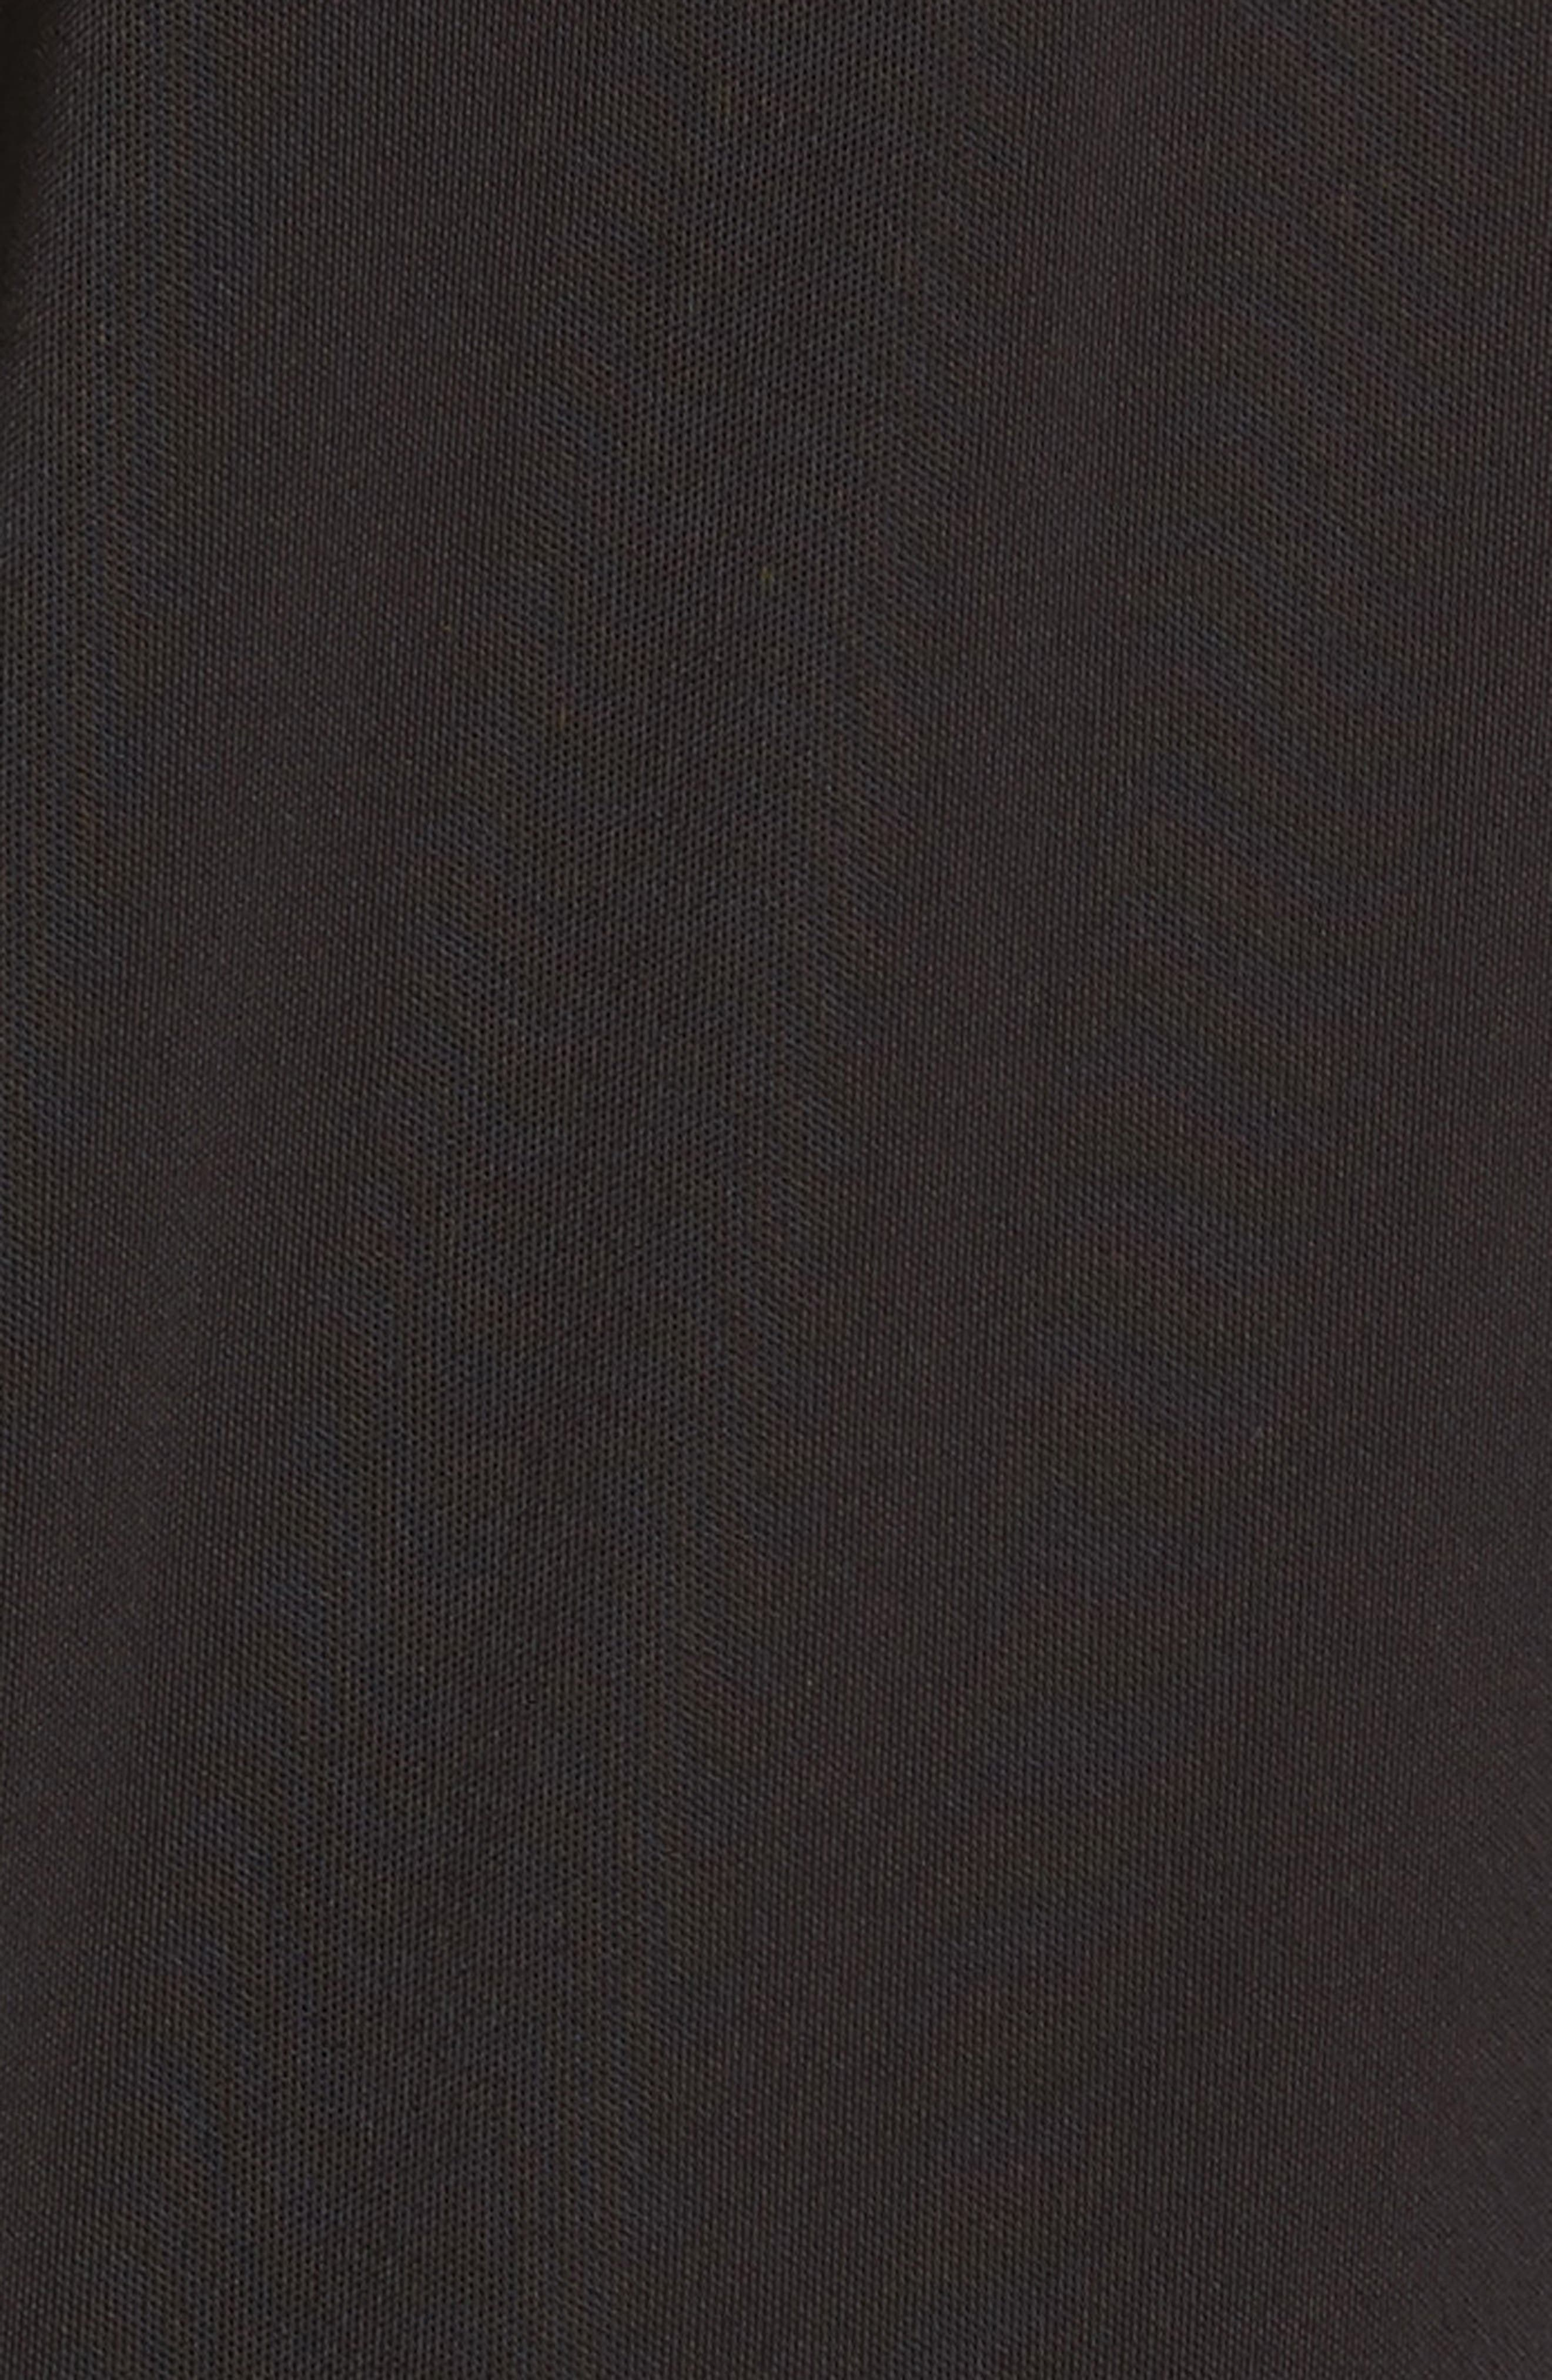 Merino Trim Turtleneck Sweater,                             Alternate thumbnail 9, color,